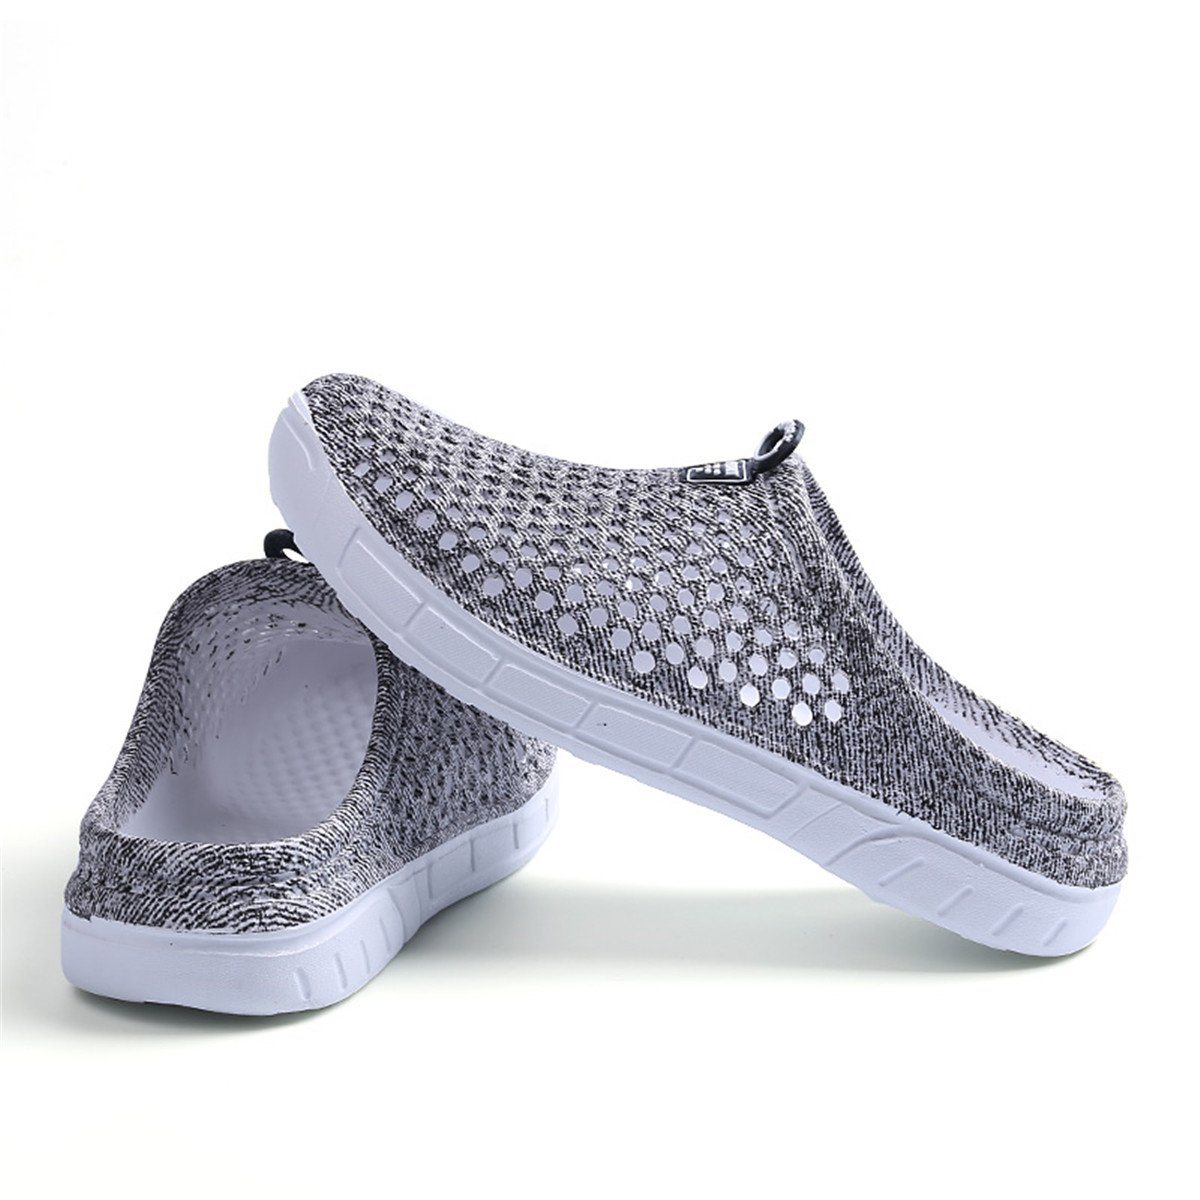 Ginjang Women's Garden Clogs Shoes Slip-on Slippers Sandals(38/Gray) by Ginjang (Image #4)